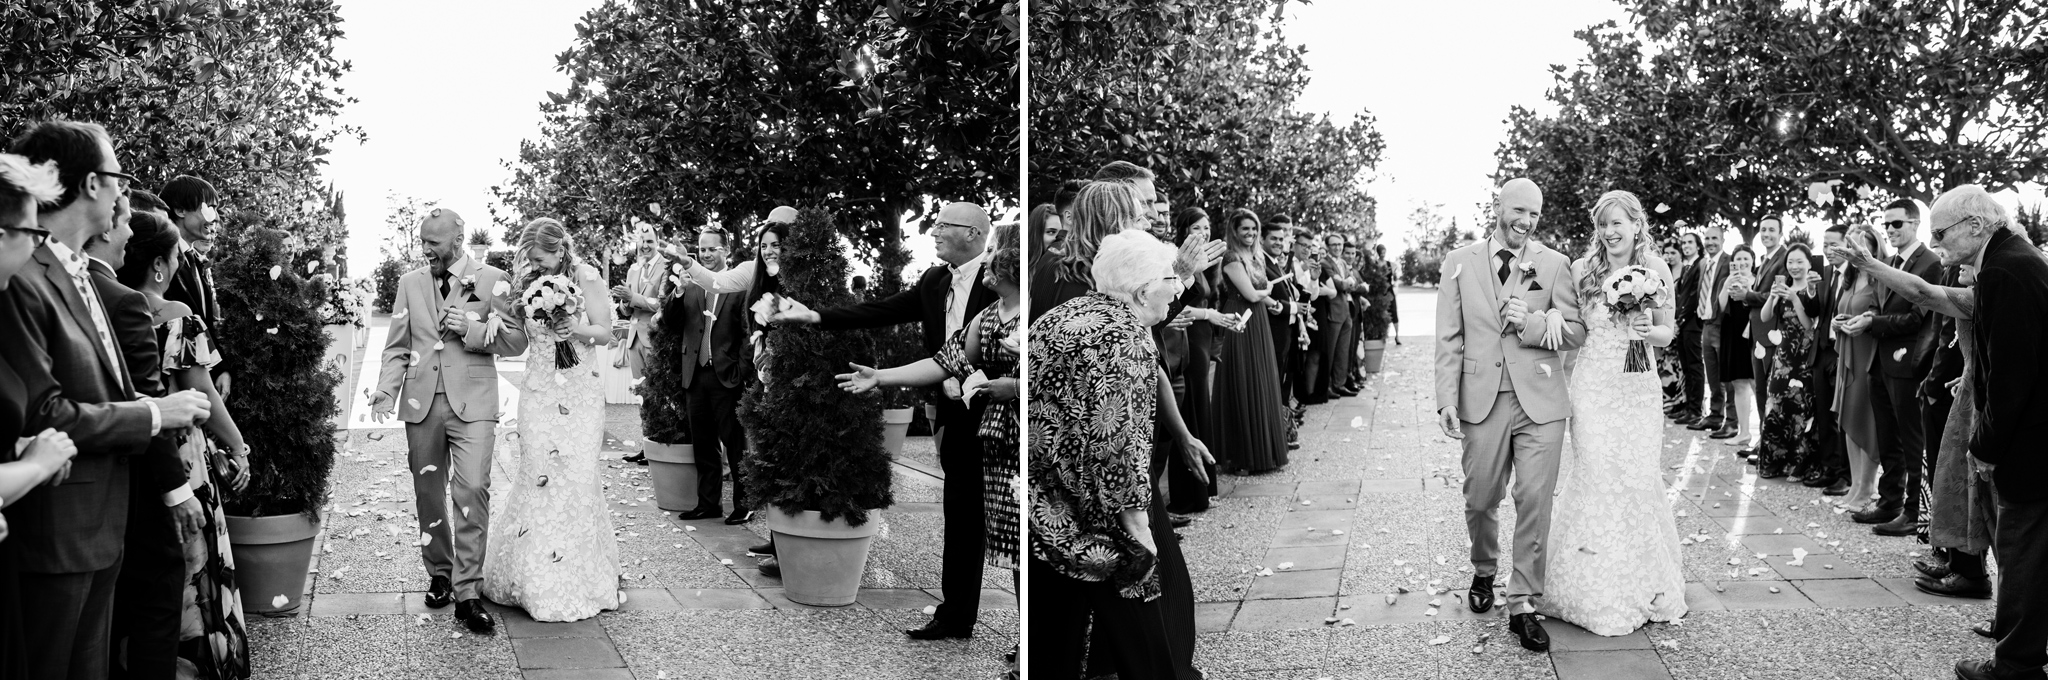 fotografia-boda-mas-sant-llei0045.jpg